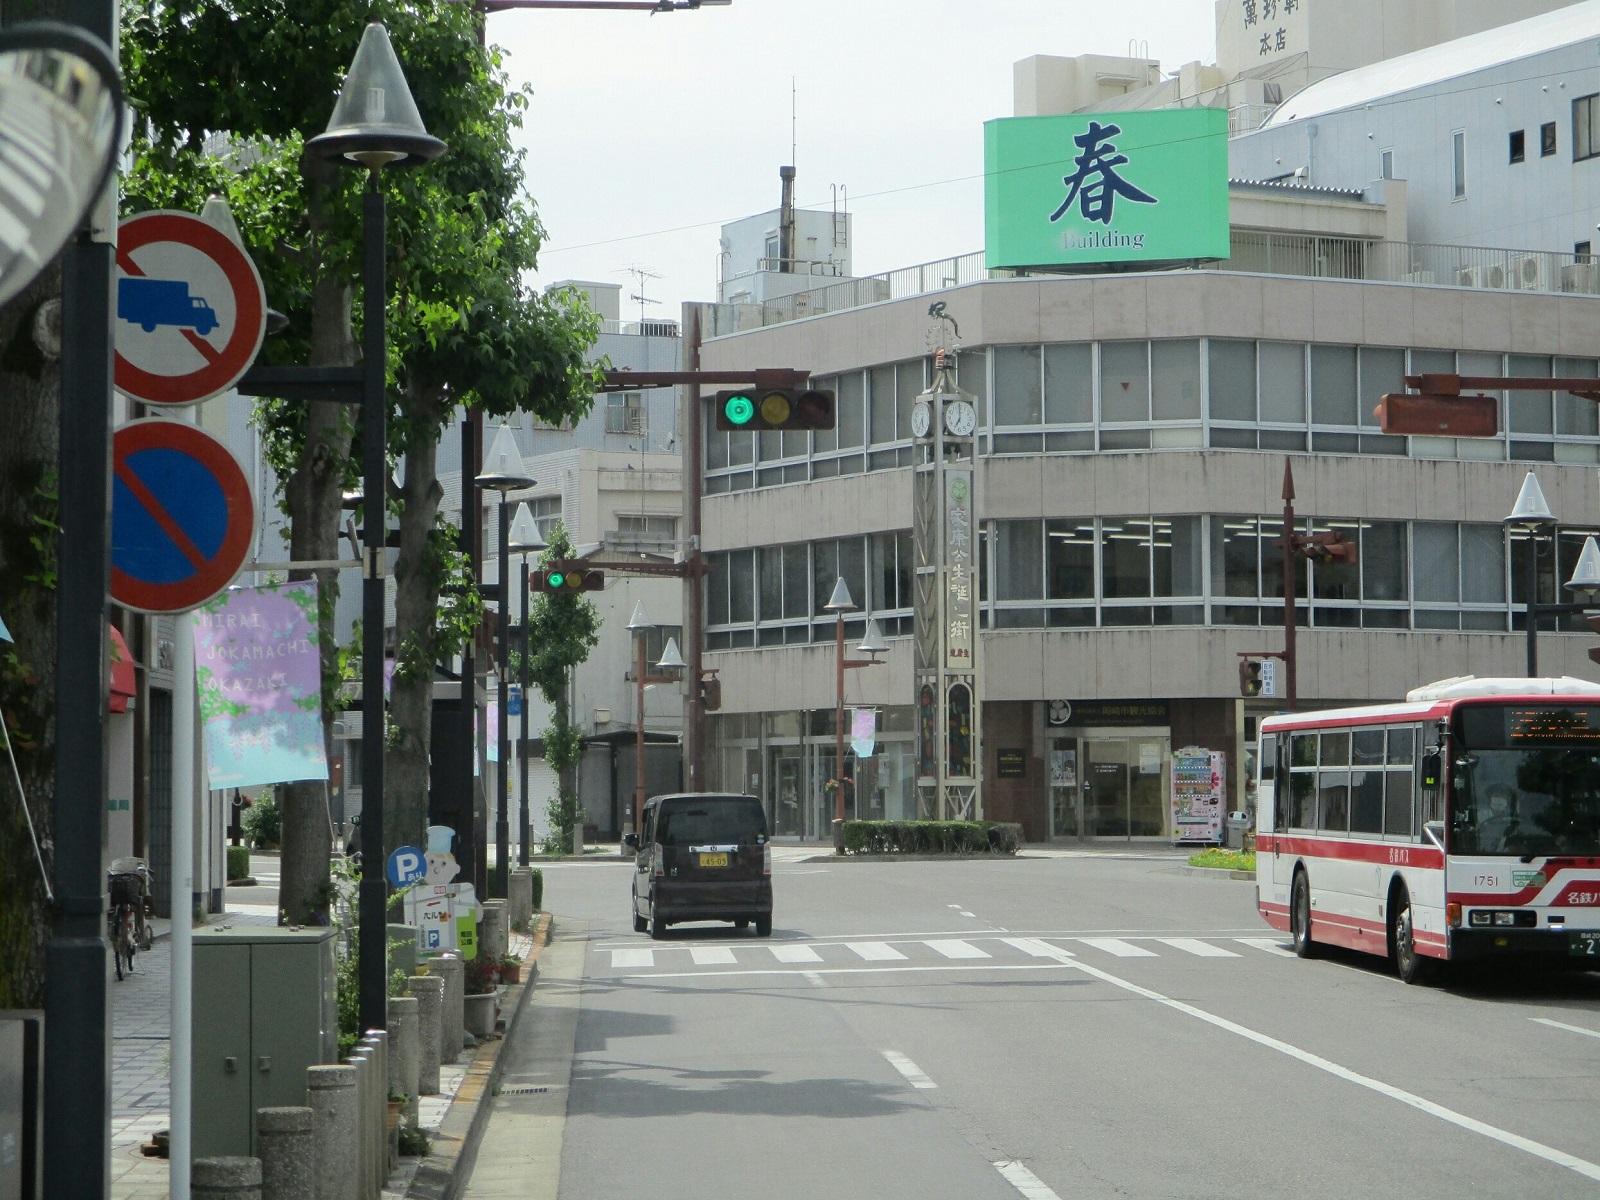 2019.6.6 (9) JRあんじょうえきいきバス - 篭田公園前バス停 1600-1200